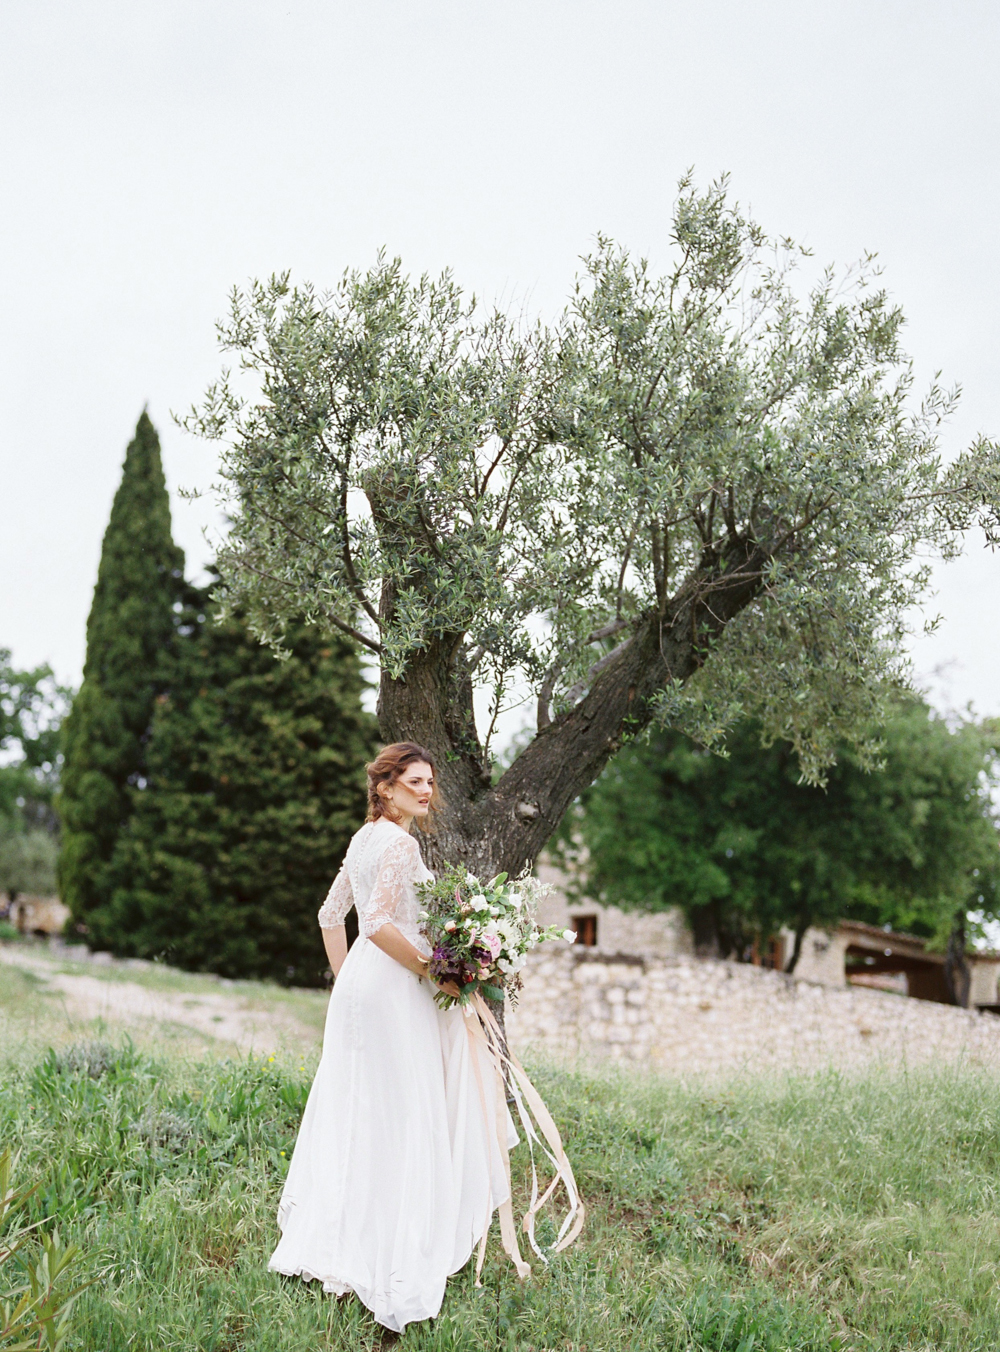 celine_chhuon_photography_provence_wedding_domaine_grillons-1.jpg